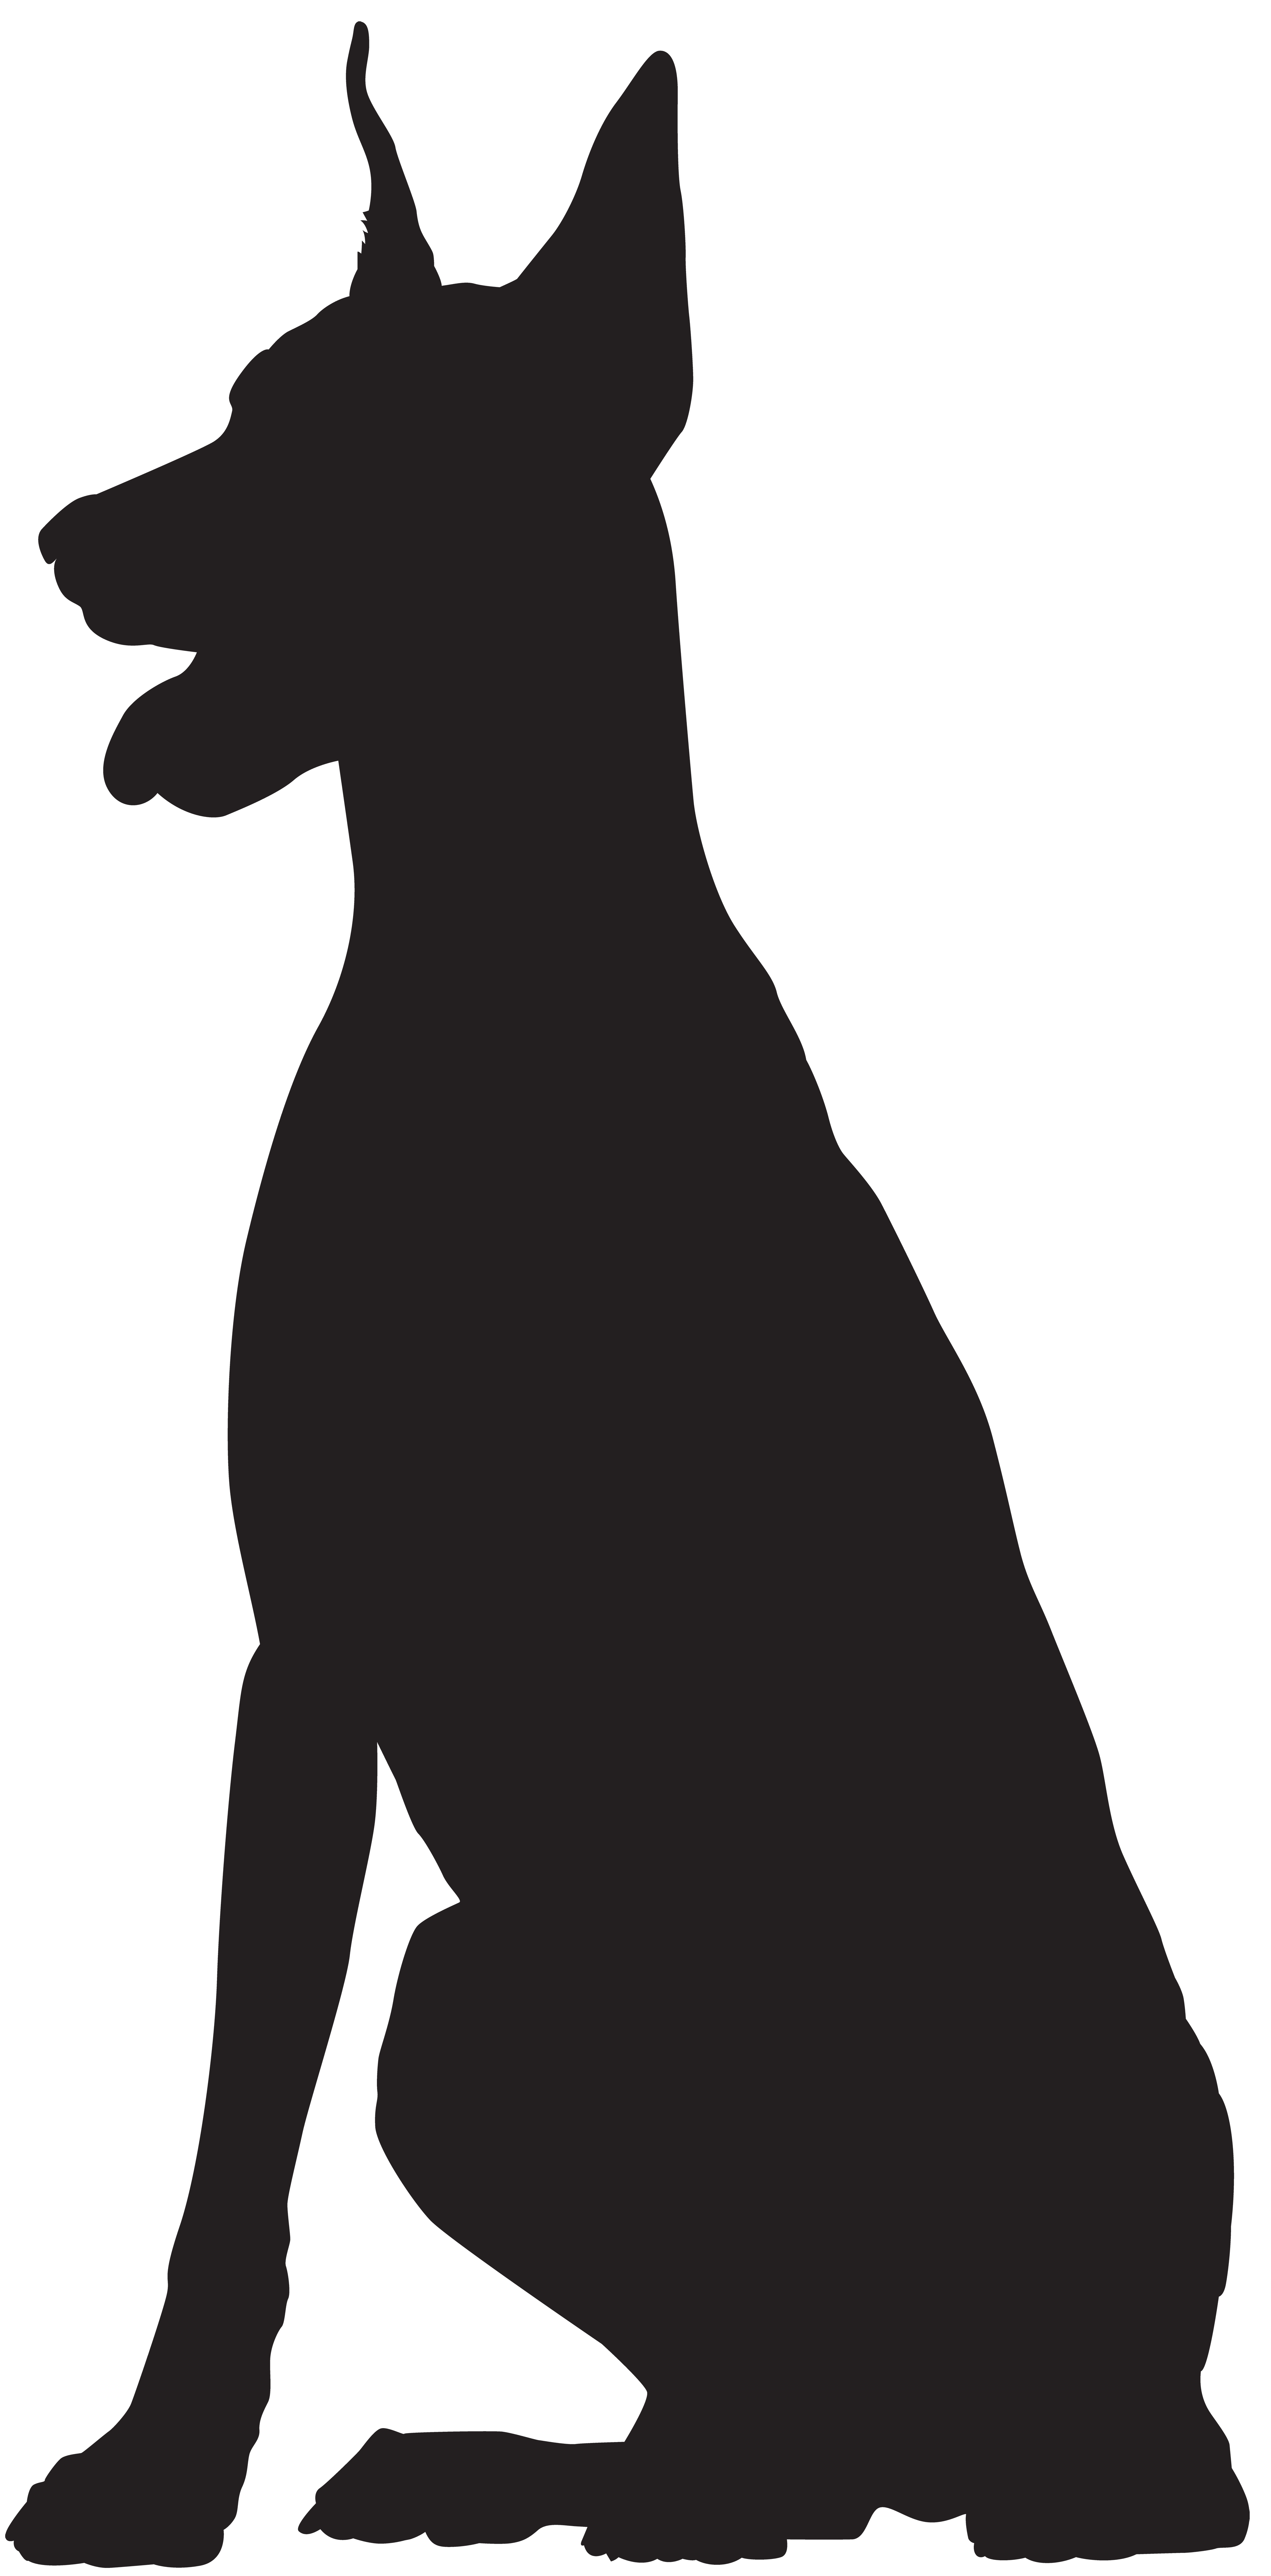 Great dane dog clipart clip Doberman Silhouette PNG Clip Art Image | Gallery Yopriceville ... clip